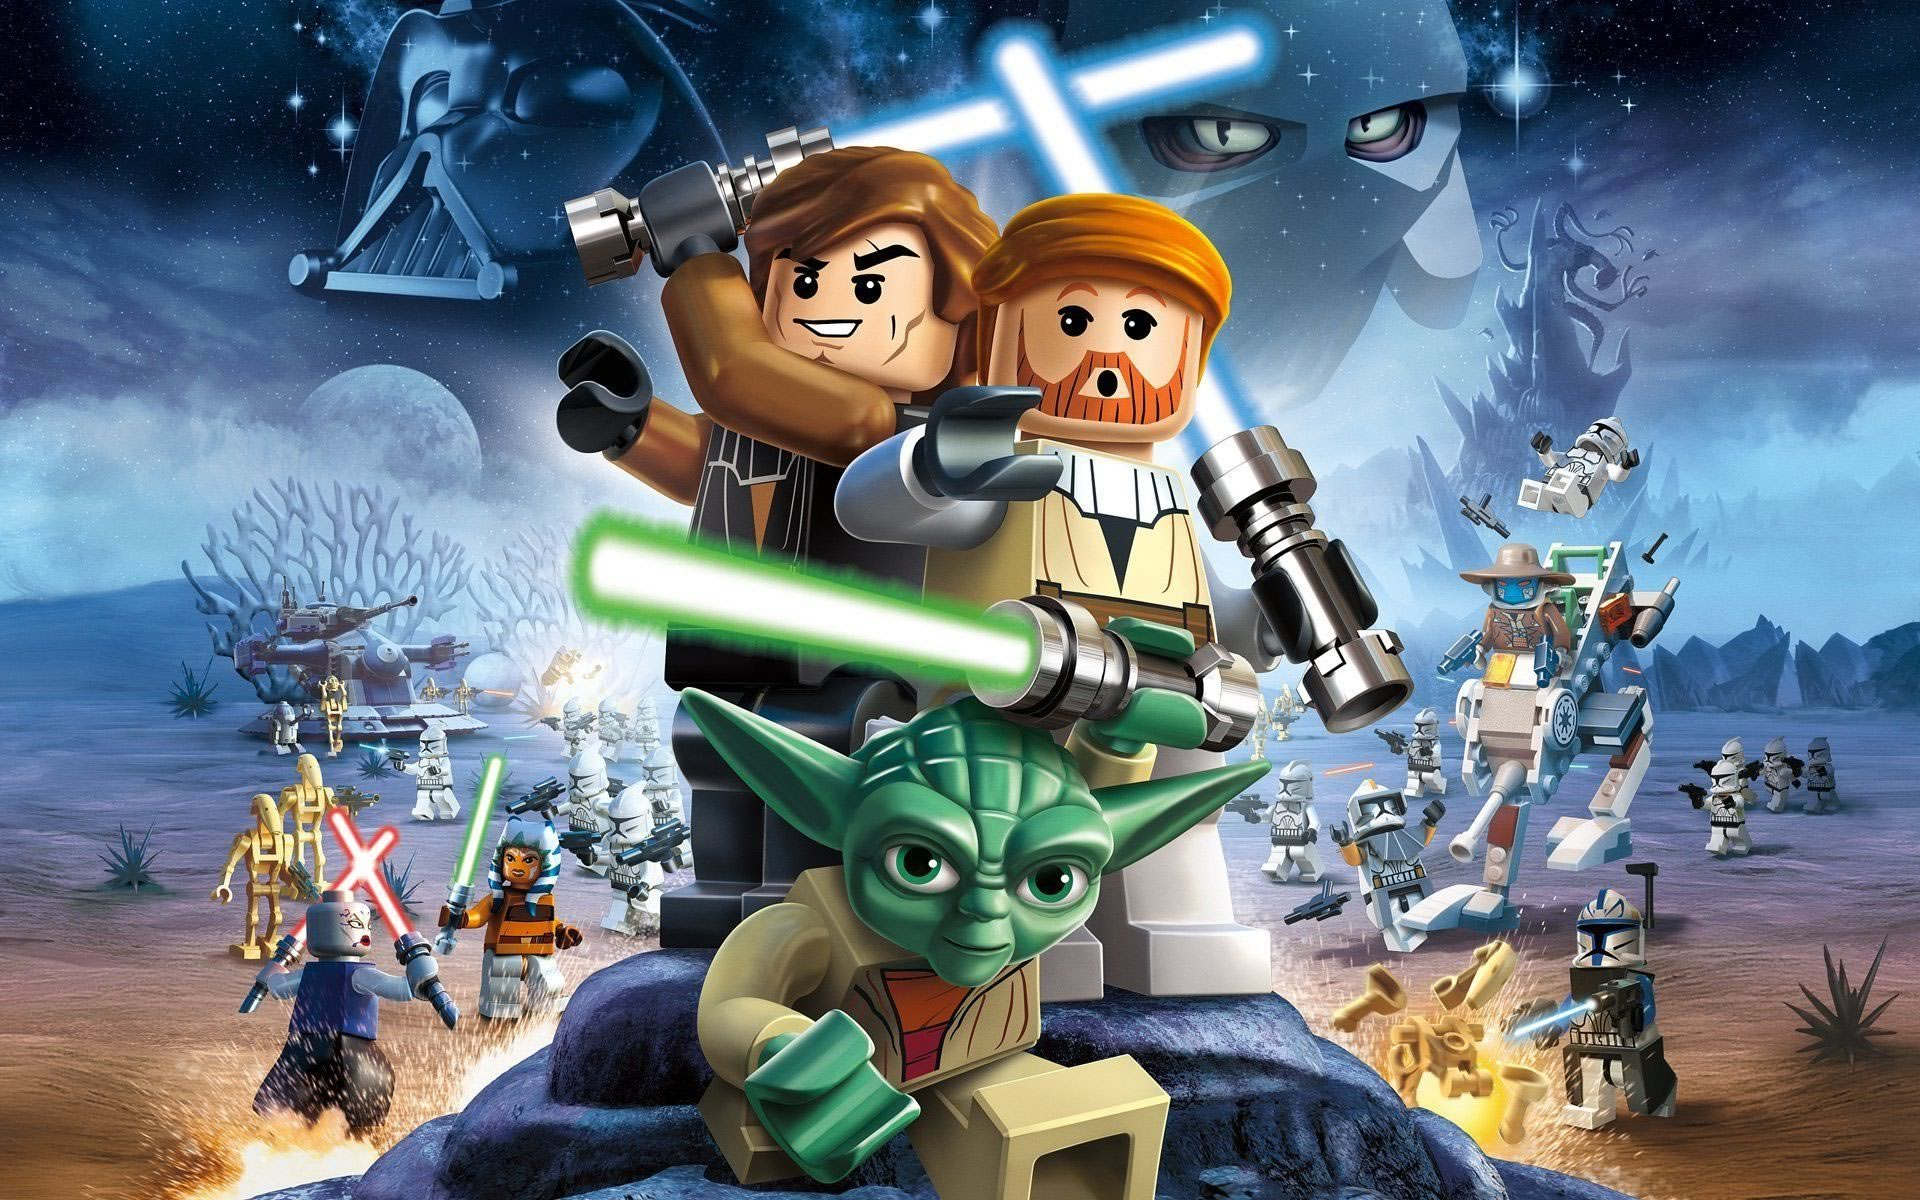 download wallpaper: LEGO Star Wars wallpaper